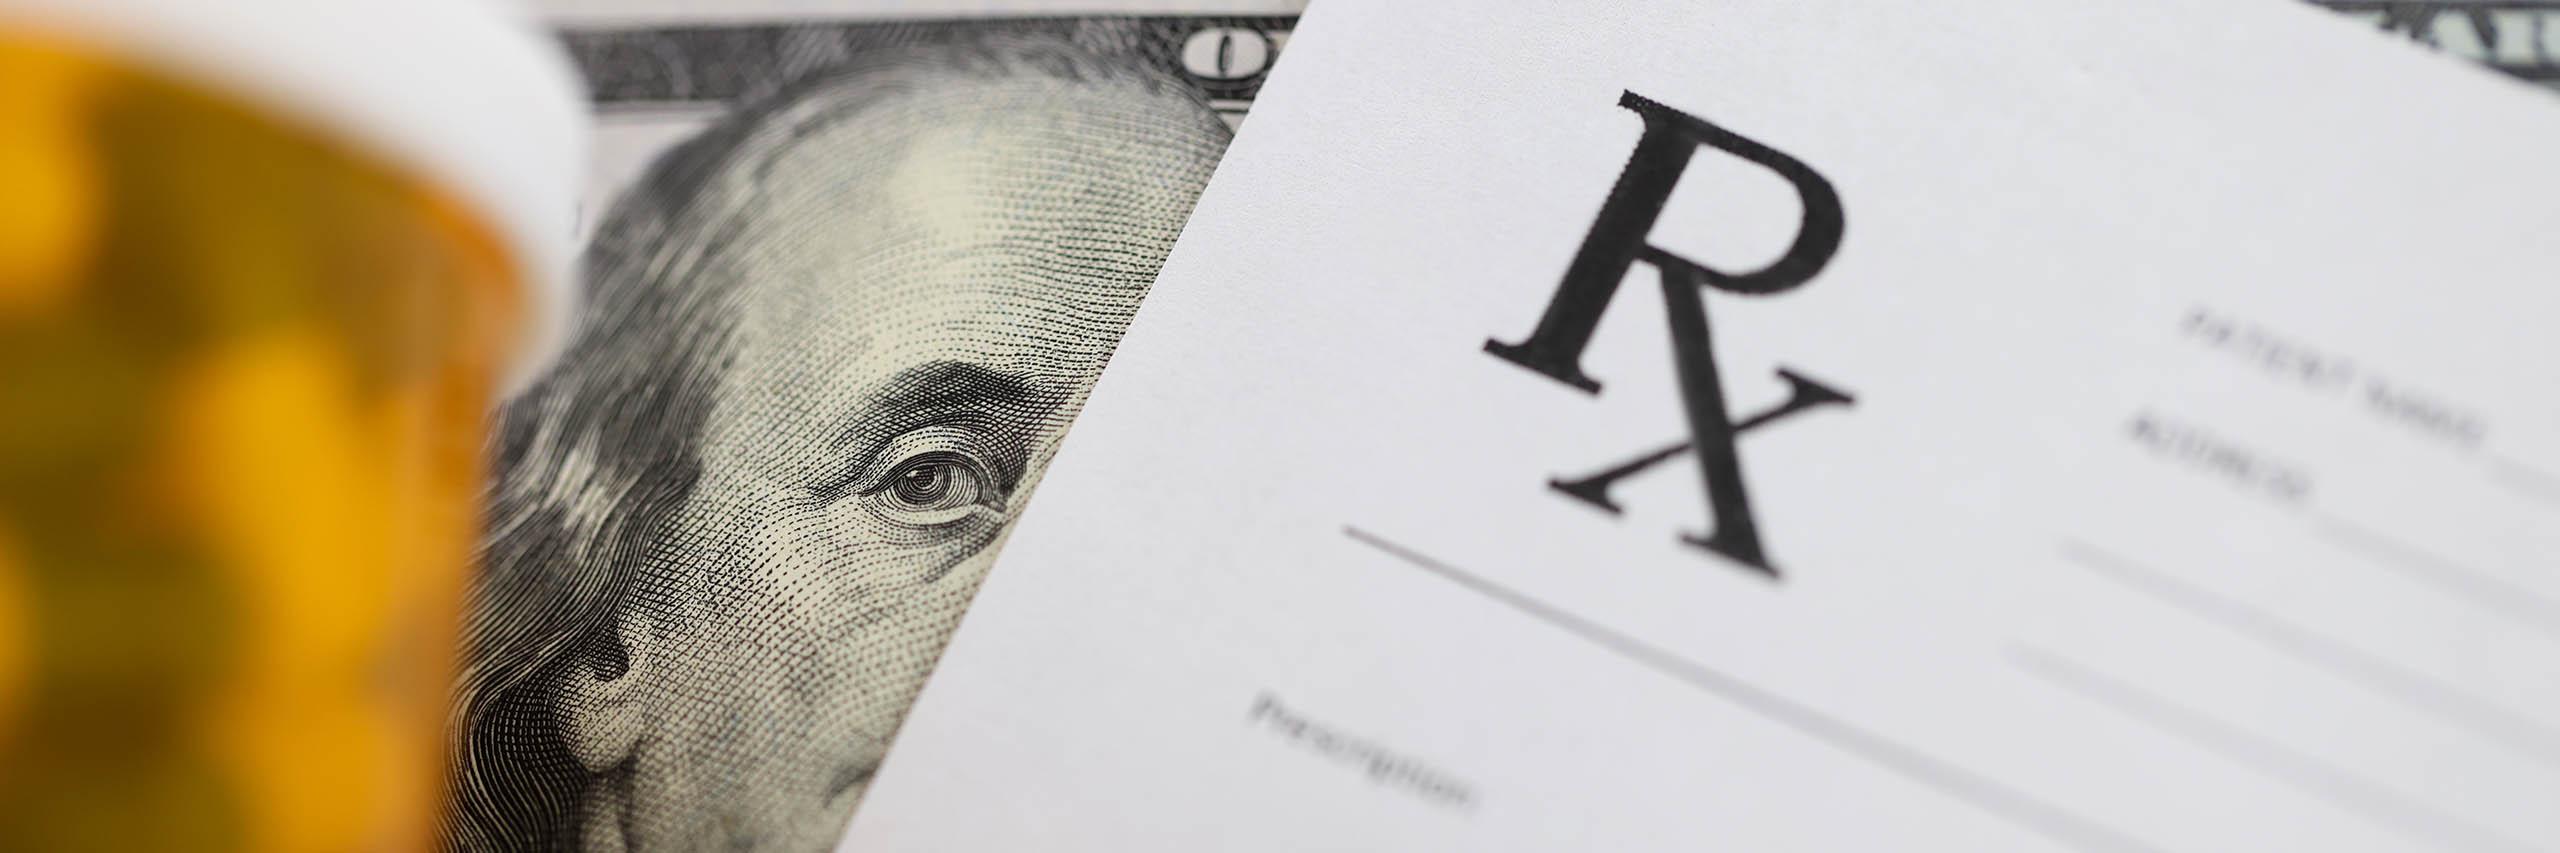 Prescription Fraud/Forgery